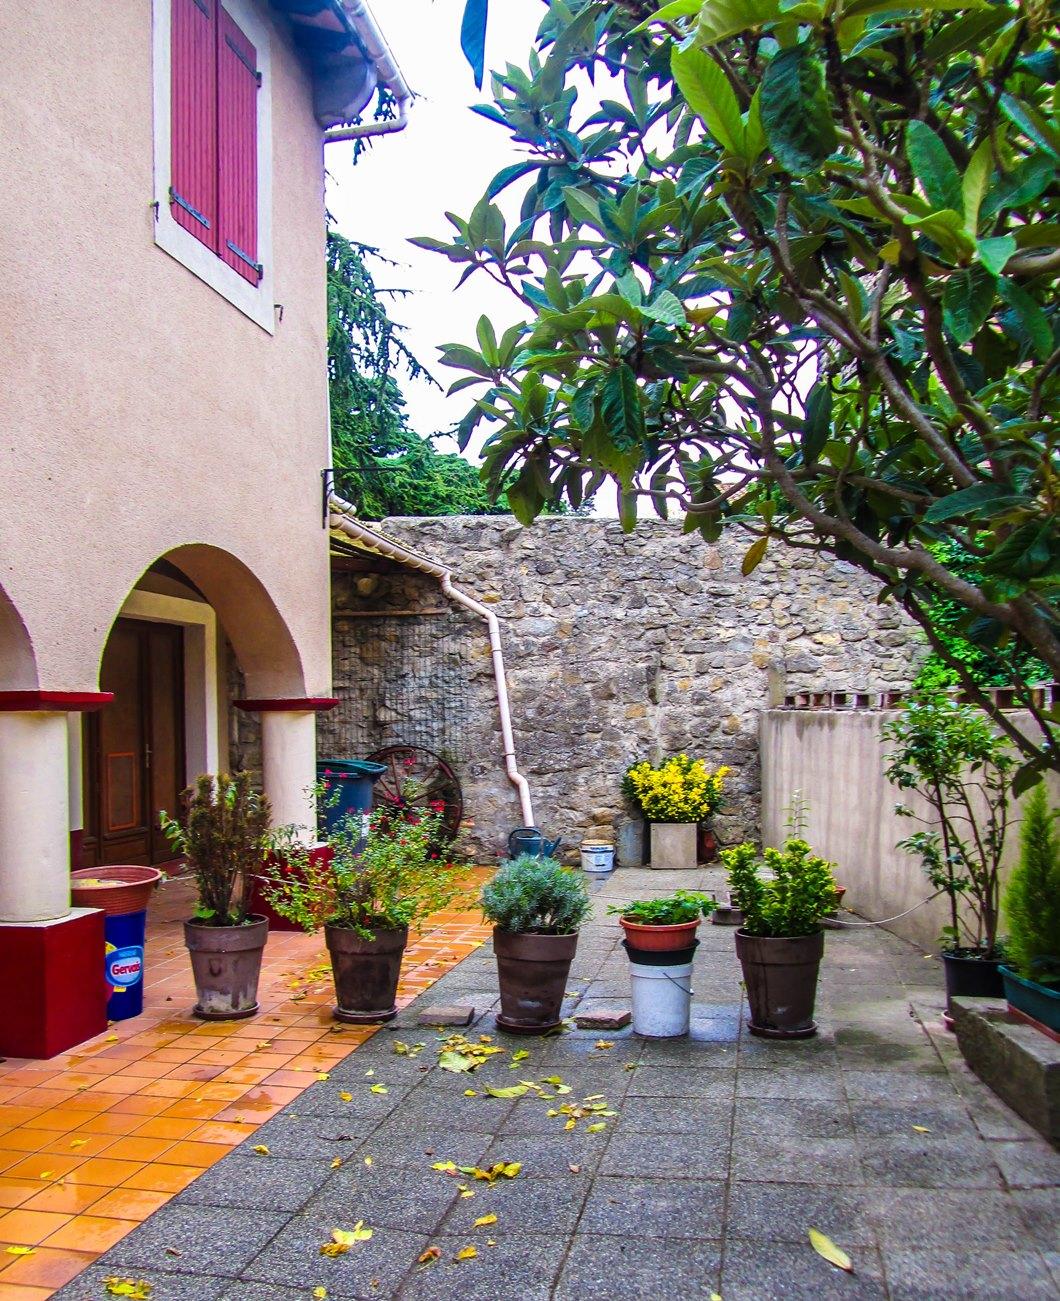 irina-fortuna-Carcassonne-france 22.jpg